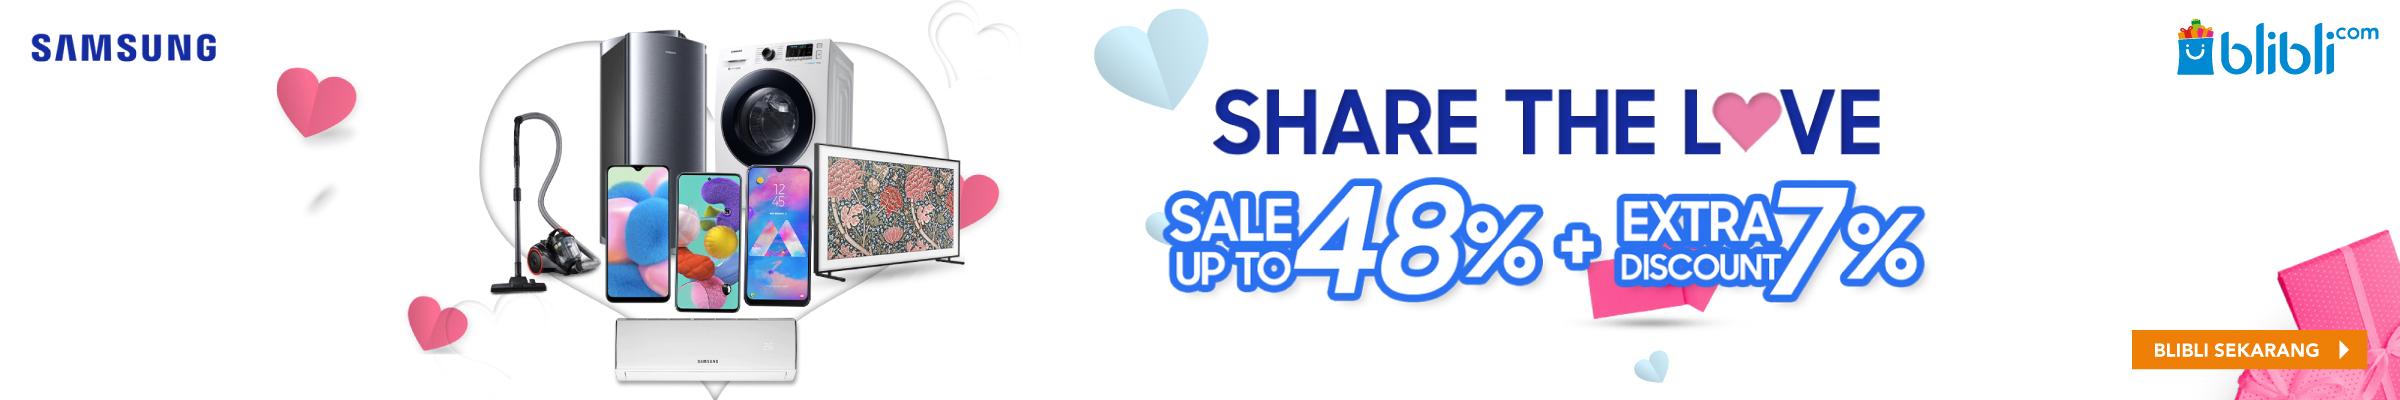 Bli-Bli Samsung Valentine Campaign